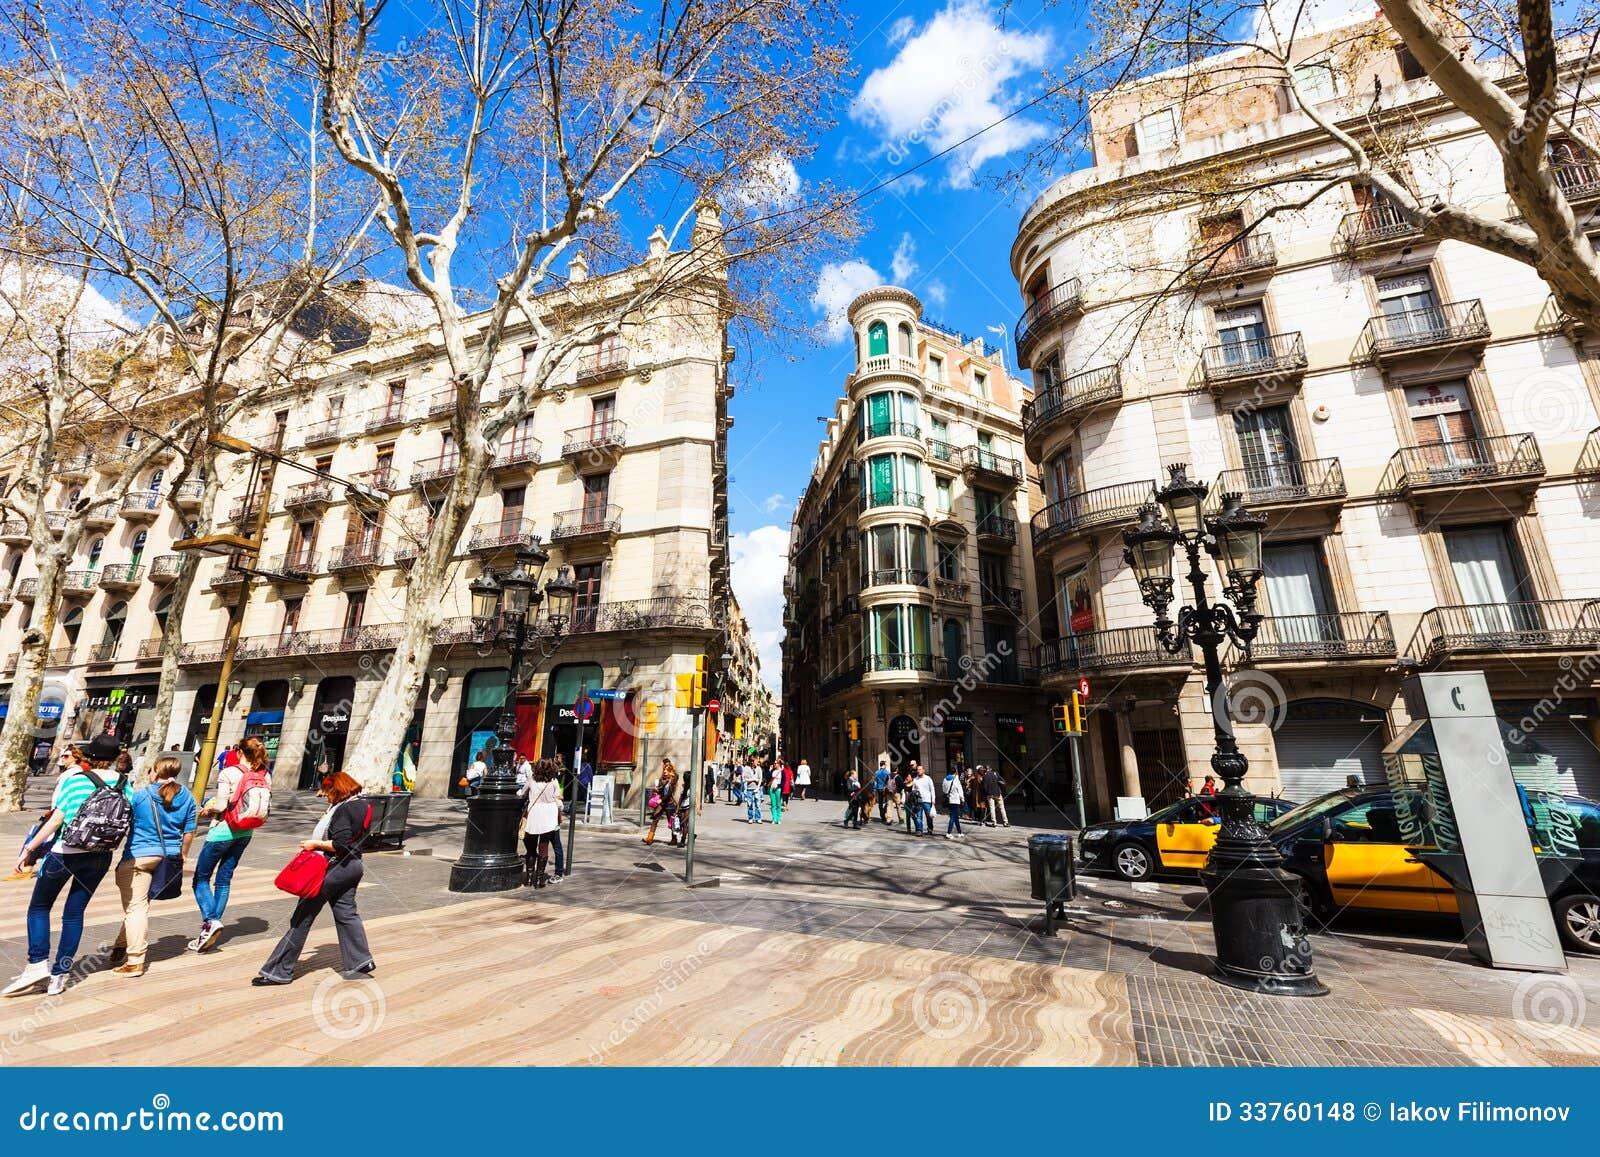 Houses At La Rambla, Barcelona. Spain Editorial Stock Photo - Image: 33760148